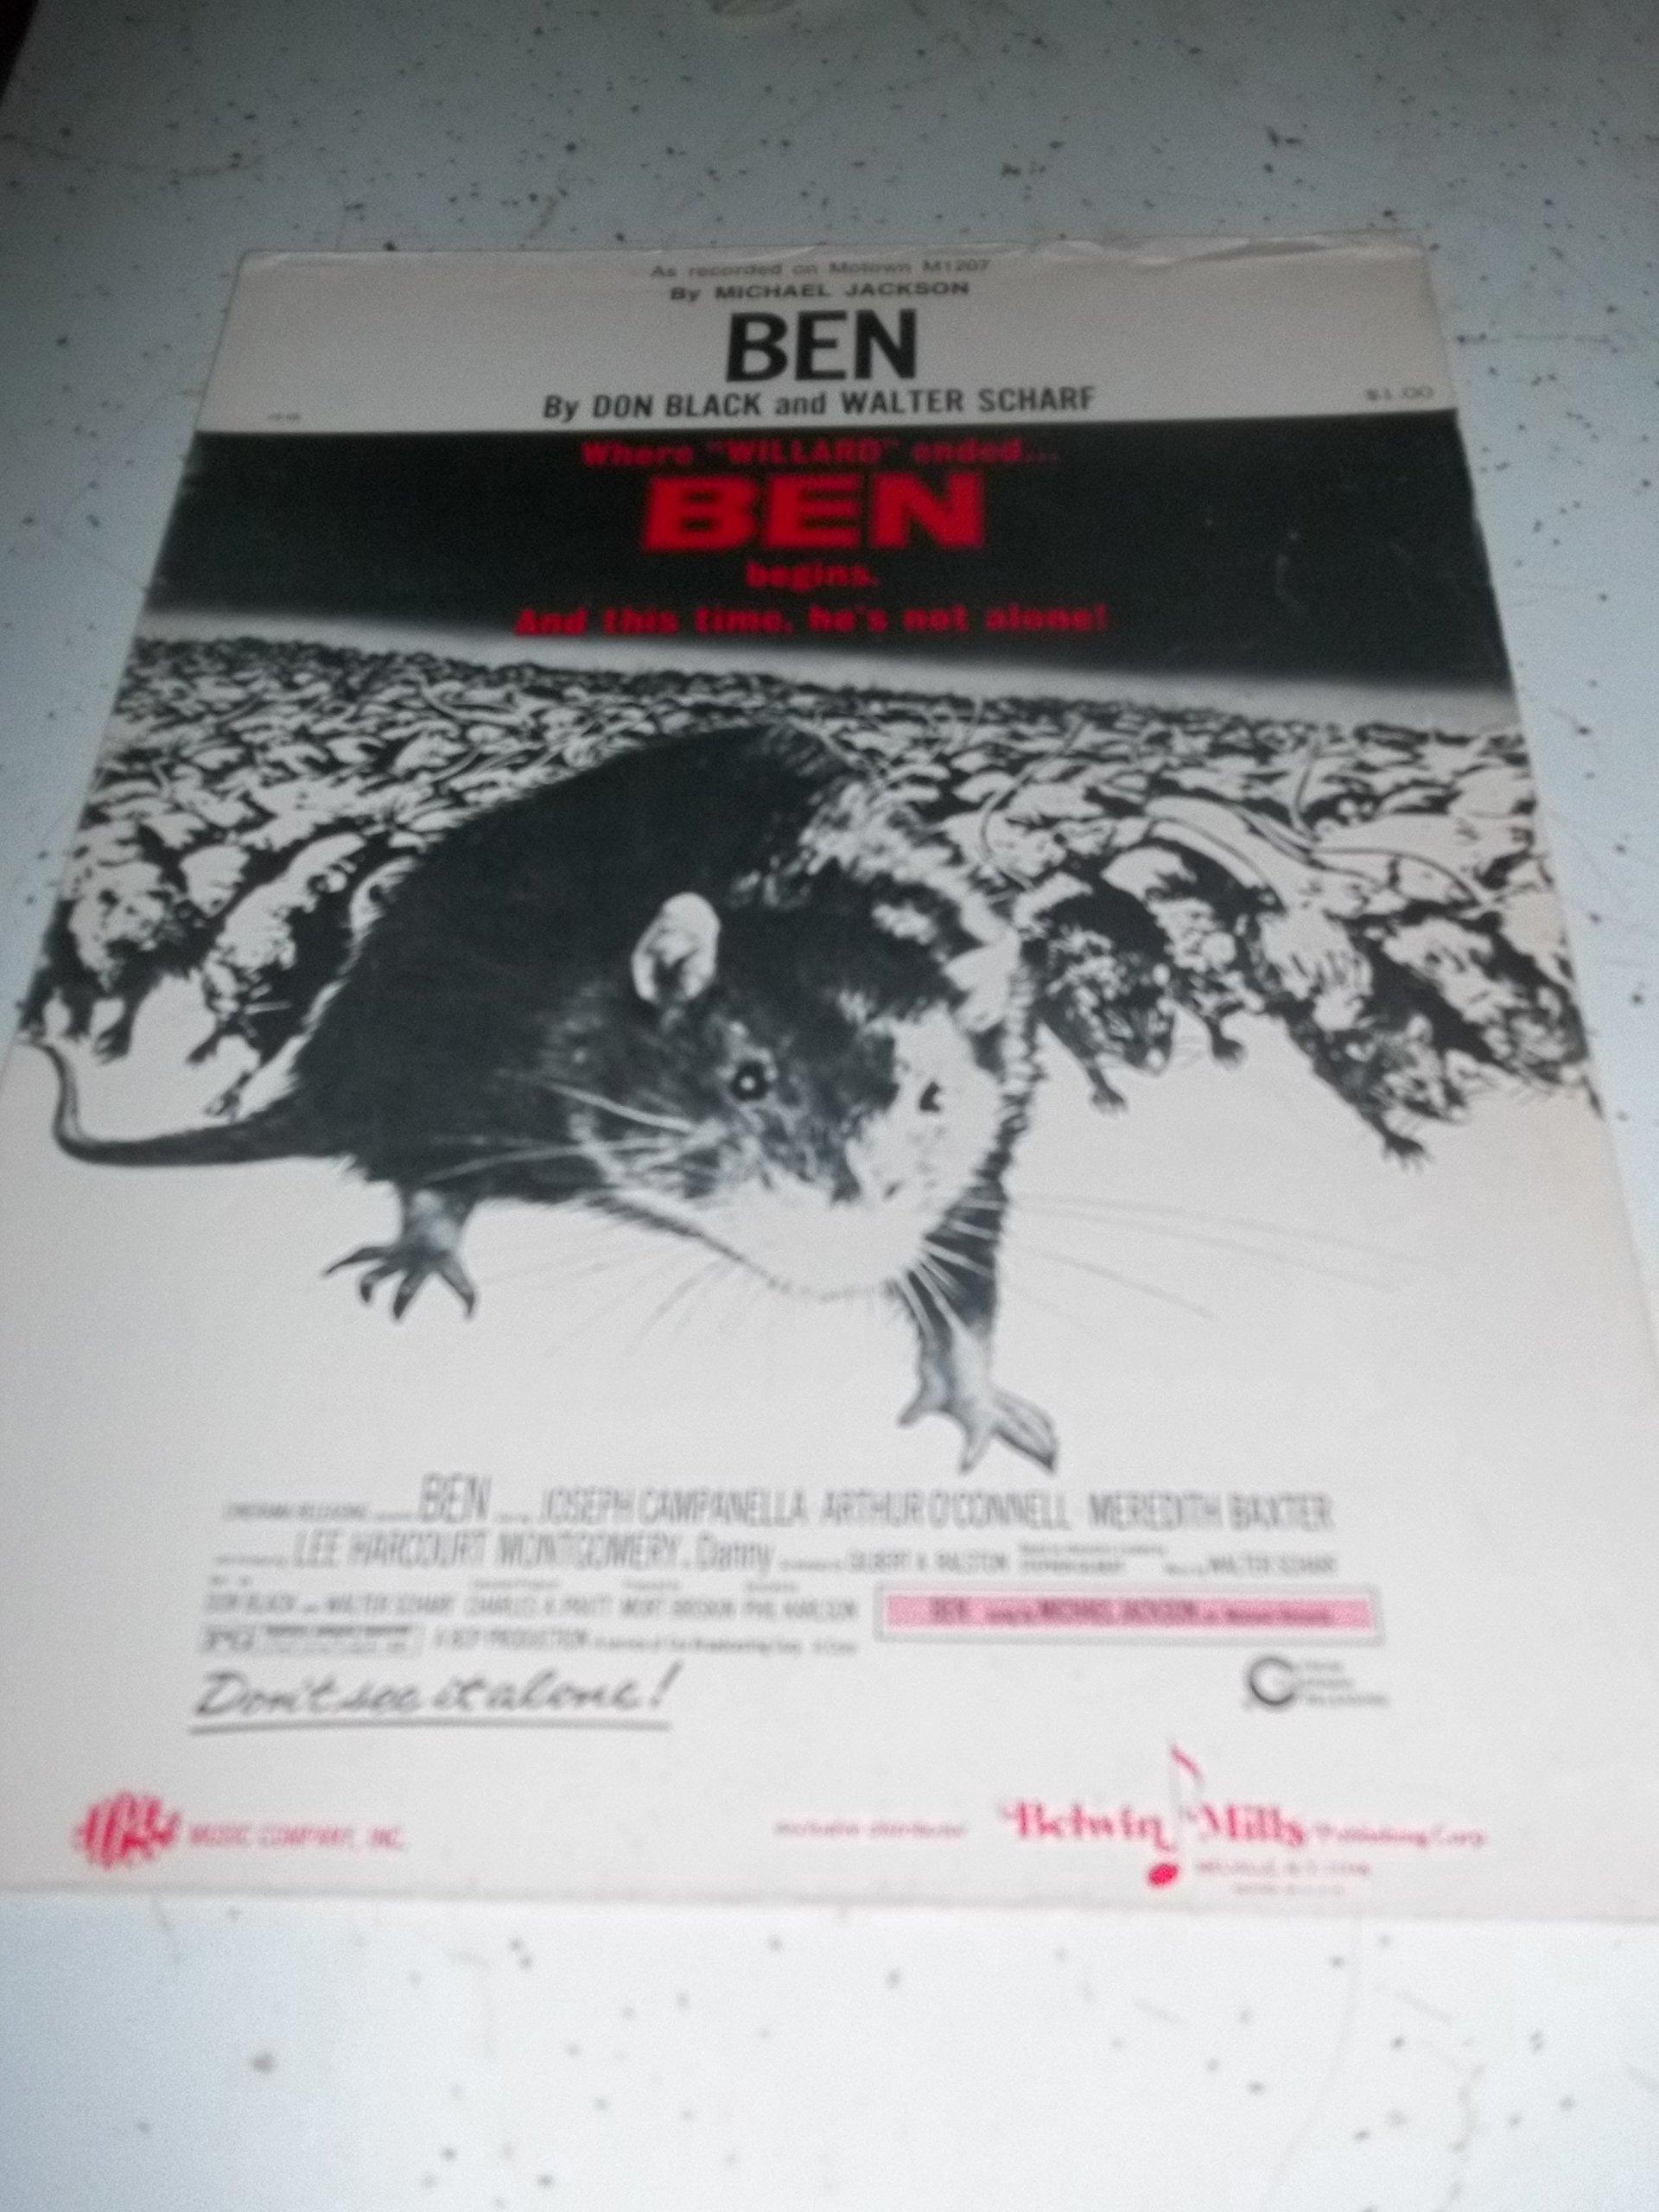 Amazon com: BEN - As Recorded by Michael Jackson, MOVIE